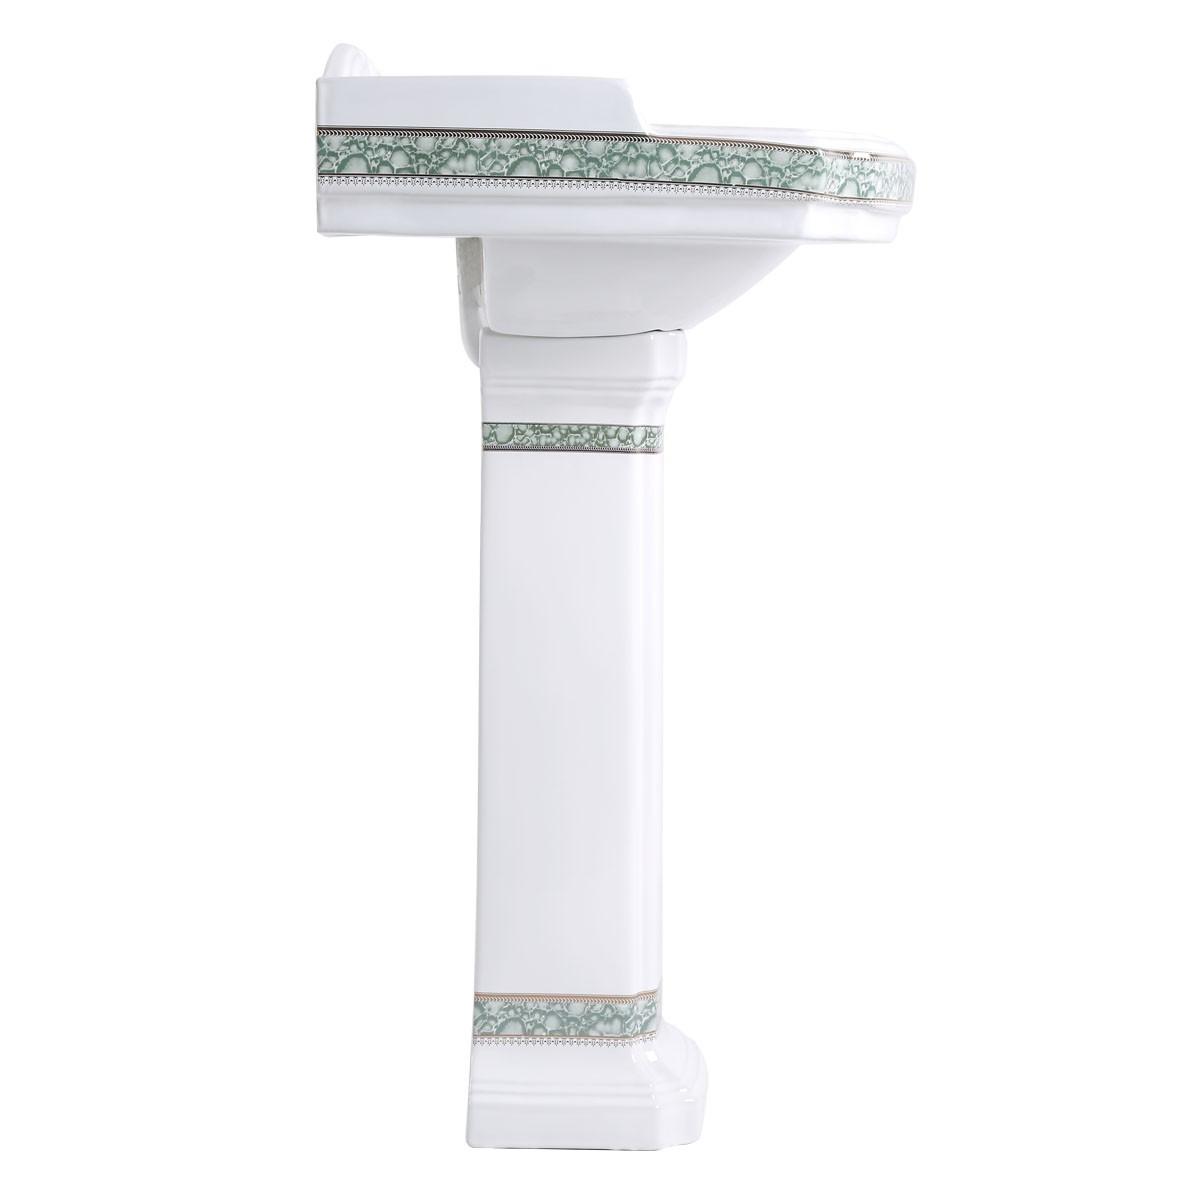 India Reserve Bathroom Pedestal Sink White Porcelain Green